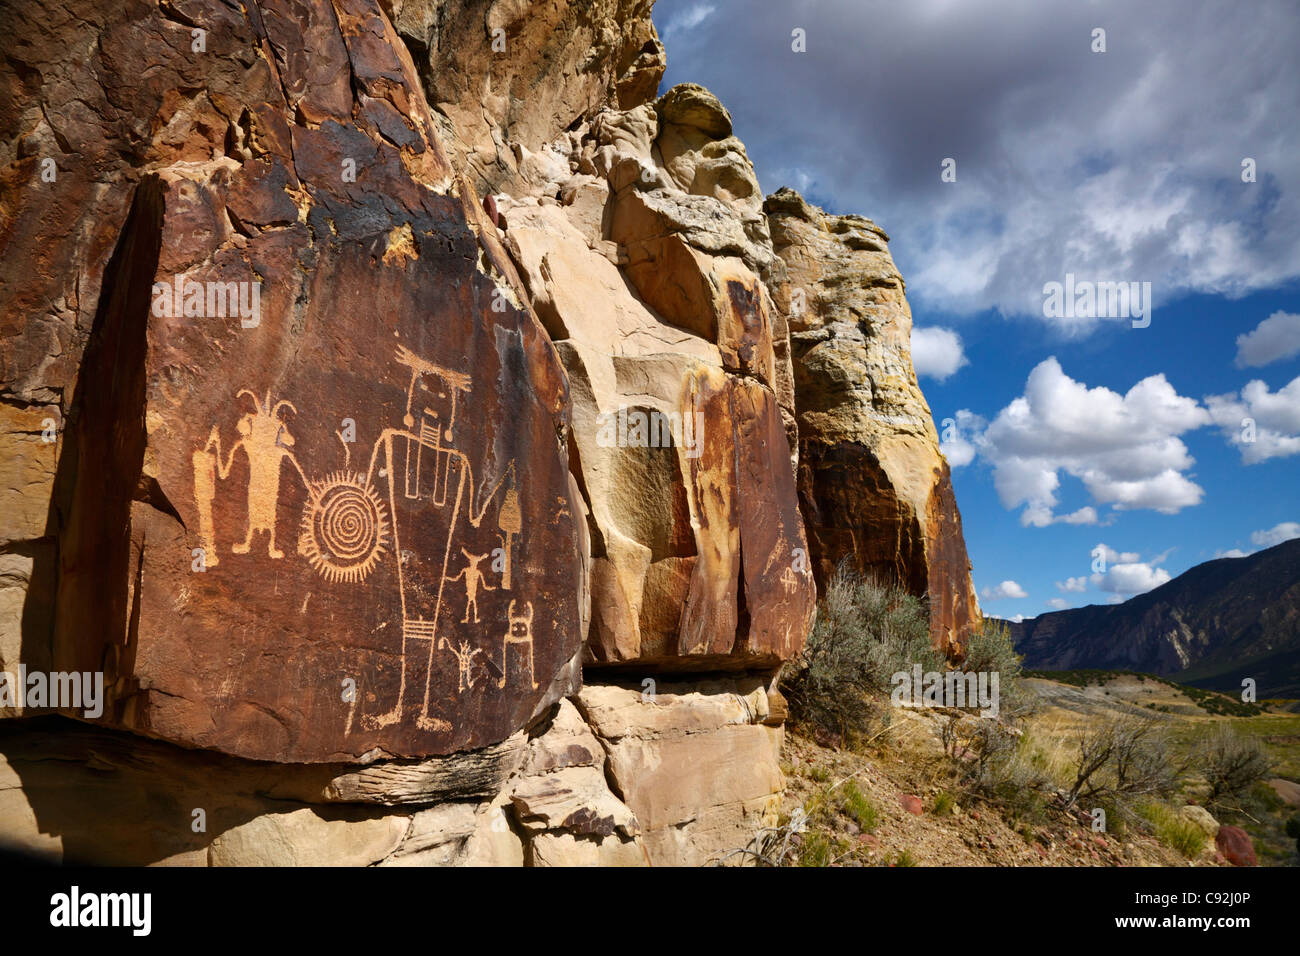 McKee Springs Petroglyphs, Dinosaur National Monument, Utah - Stock Image